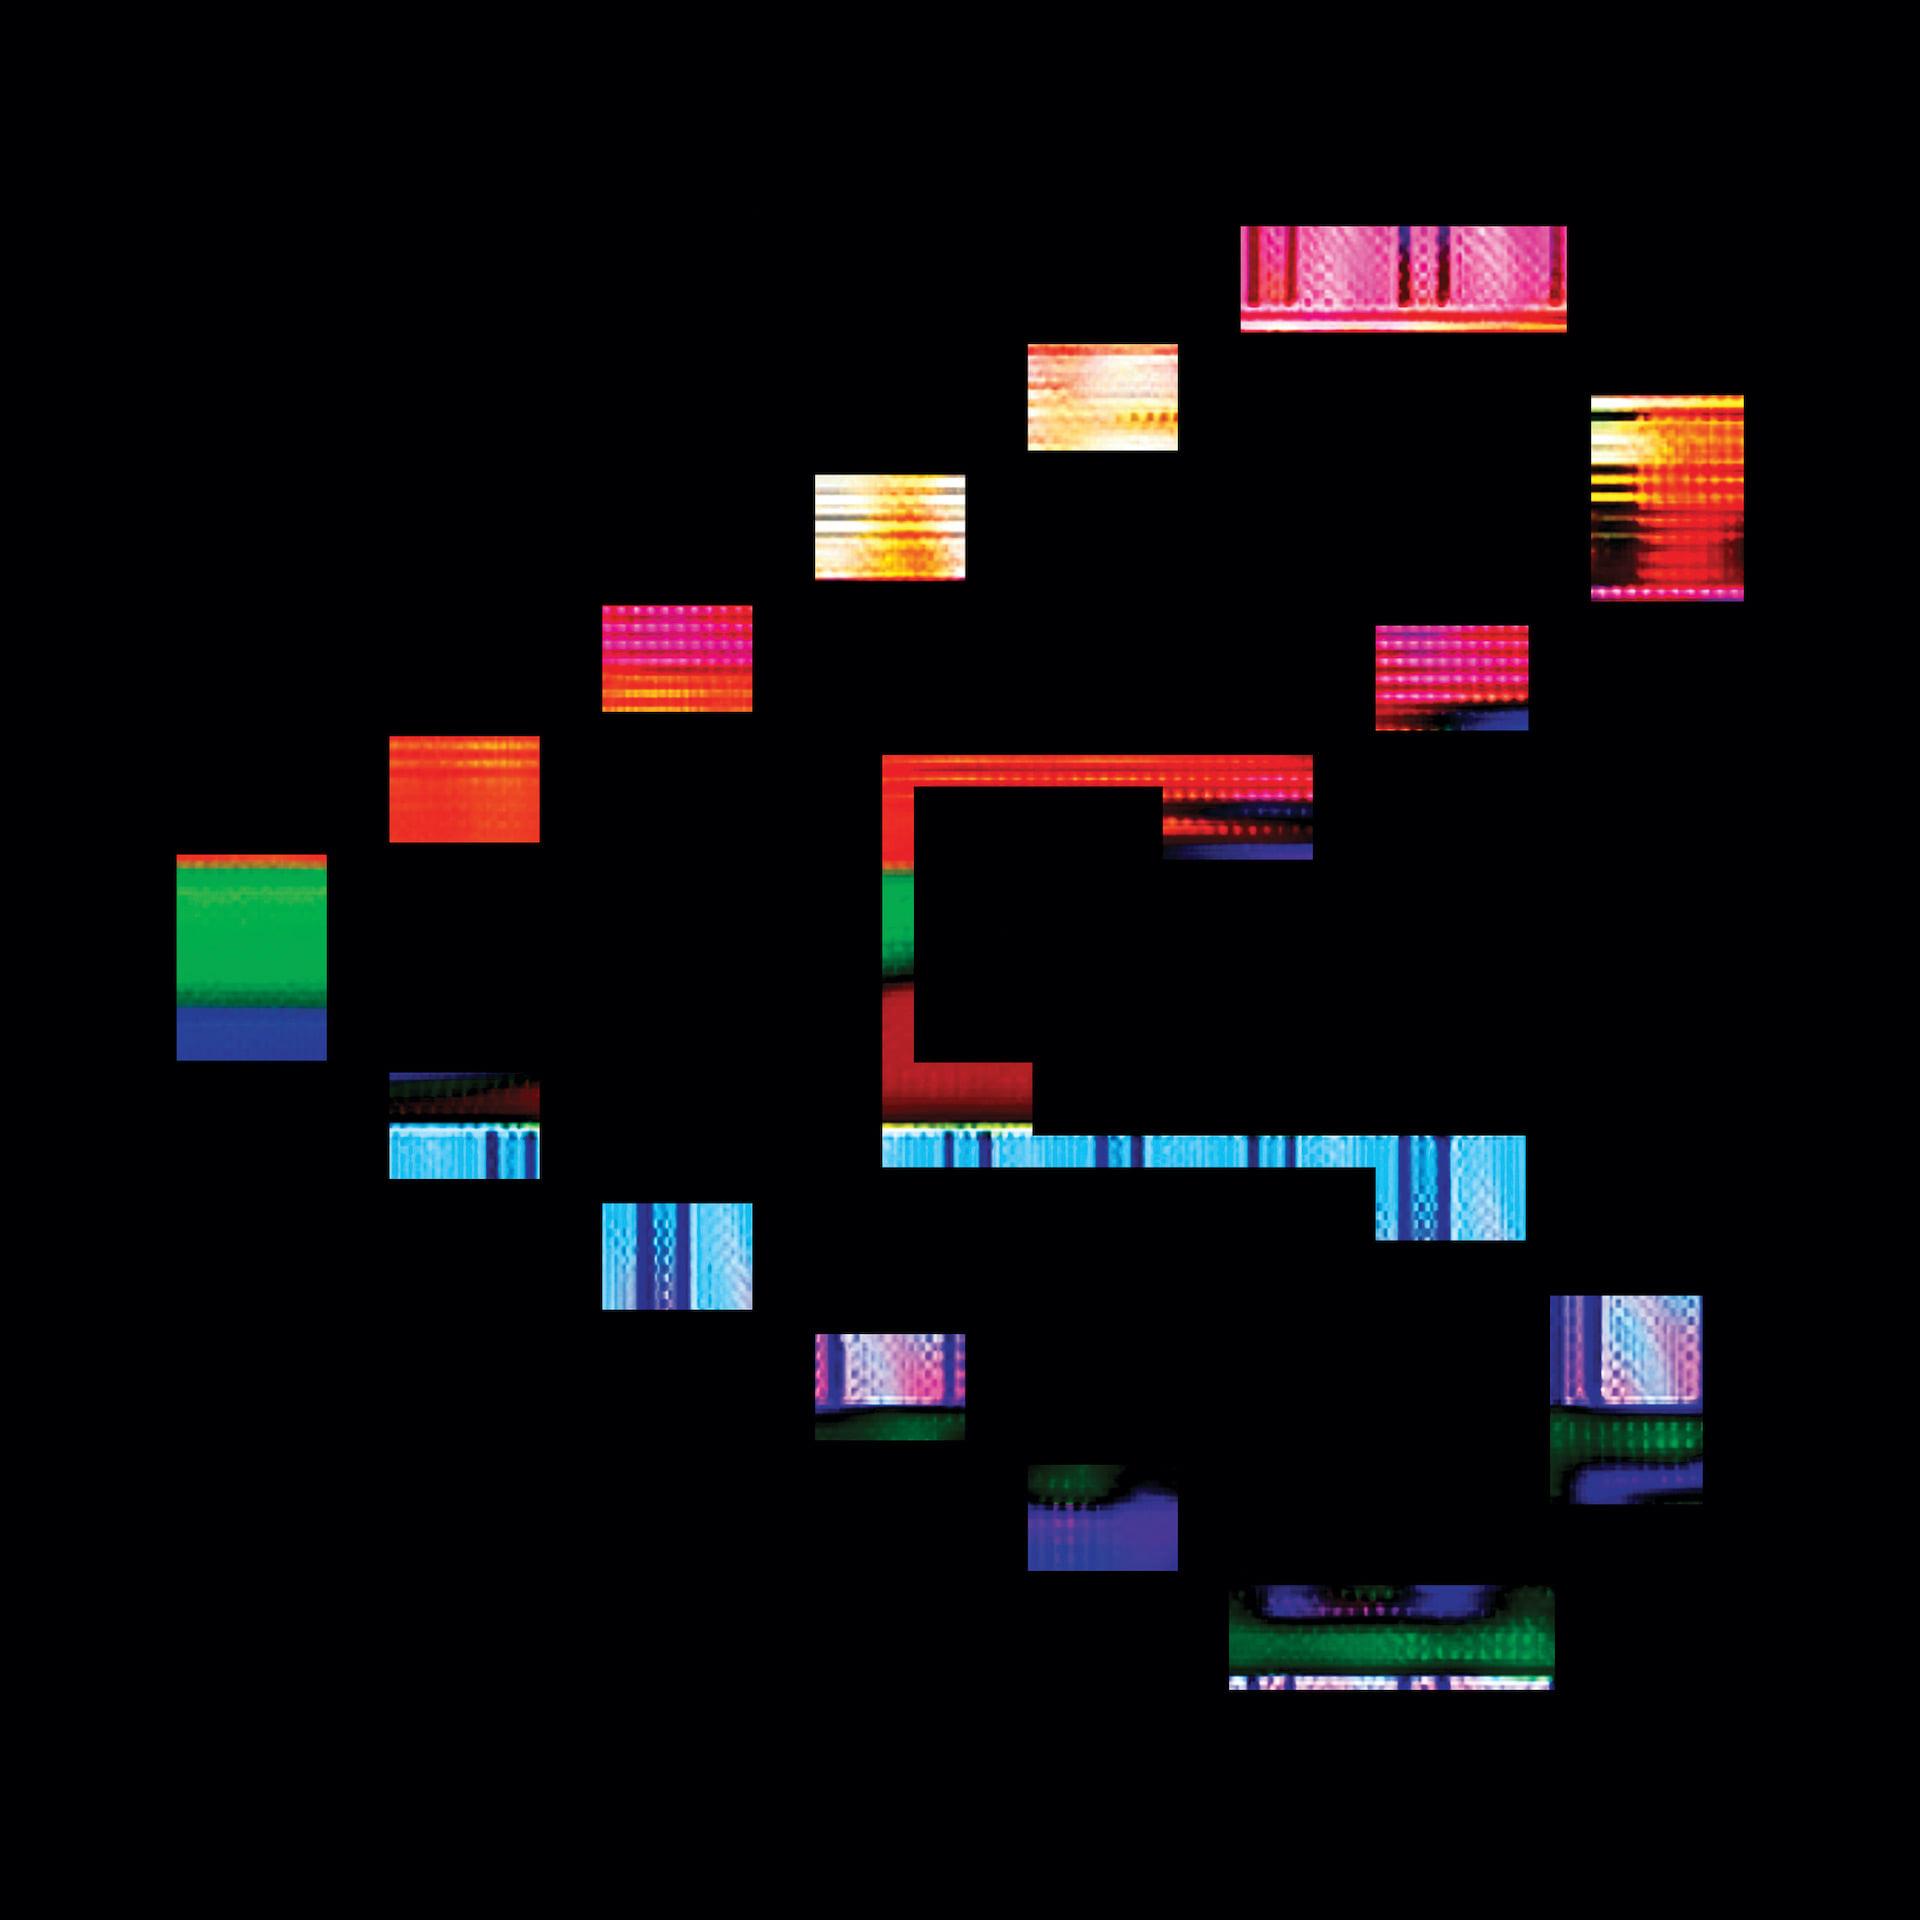 Squarepusherが機材を弄り倒す!スタジオセッション「Acid Furlough」の映像が公開&最新ツアーグッズが追加発売 music200518_squarepusher_video5-1920x1920